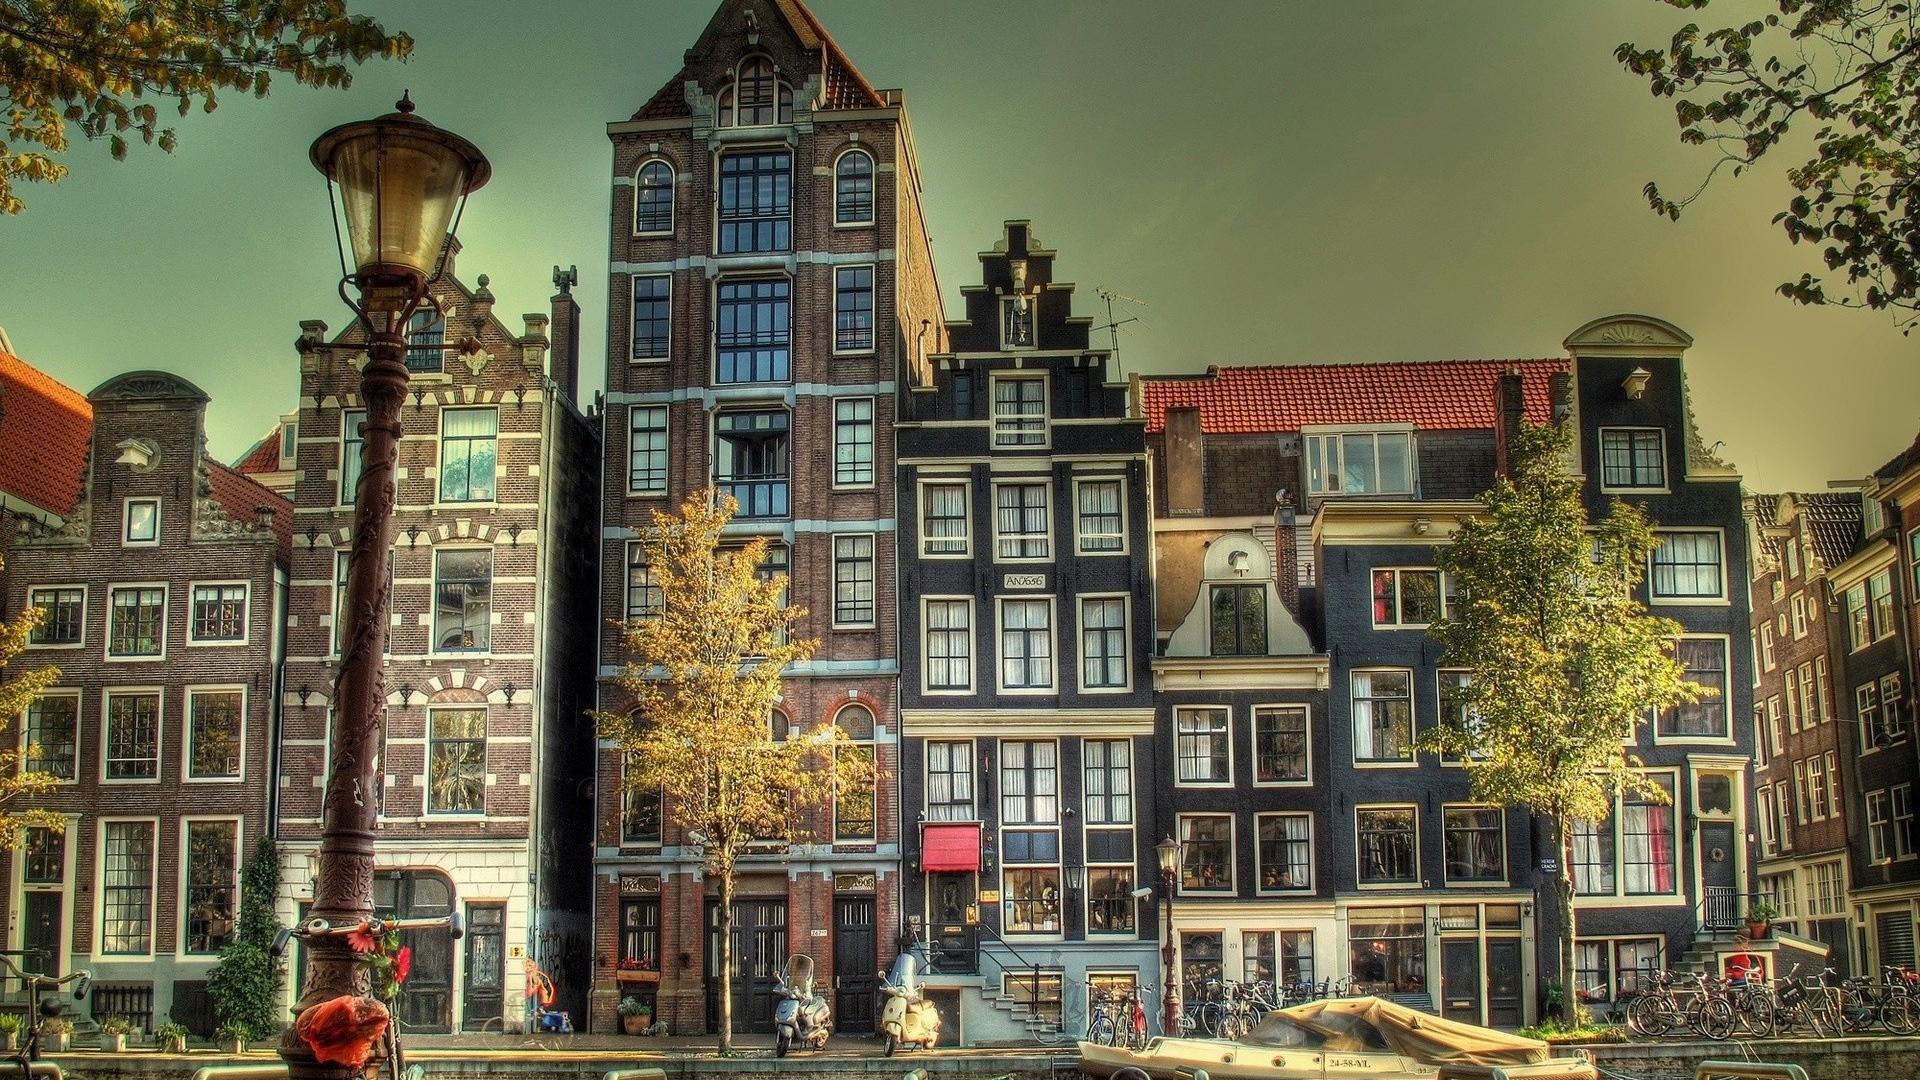 Best Nature Wallpapers Hd Free Download Amsterdam Backgrounds Free Download Pixelstalk Net